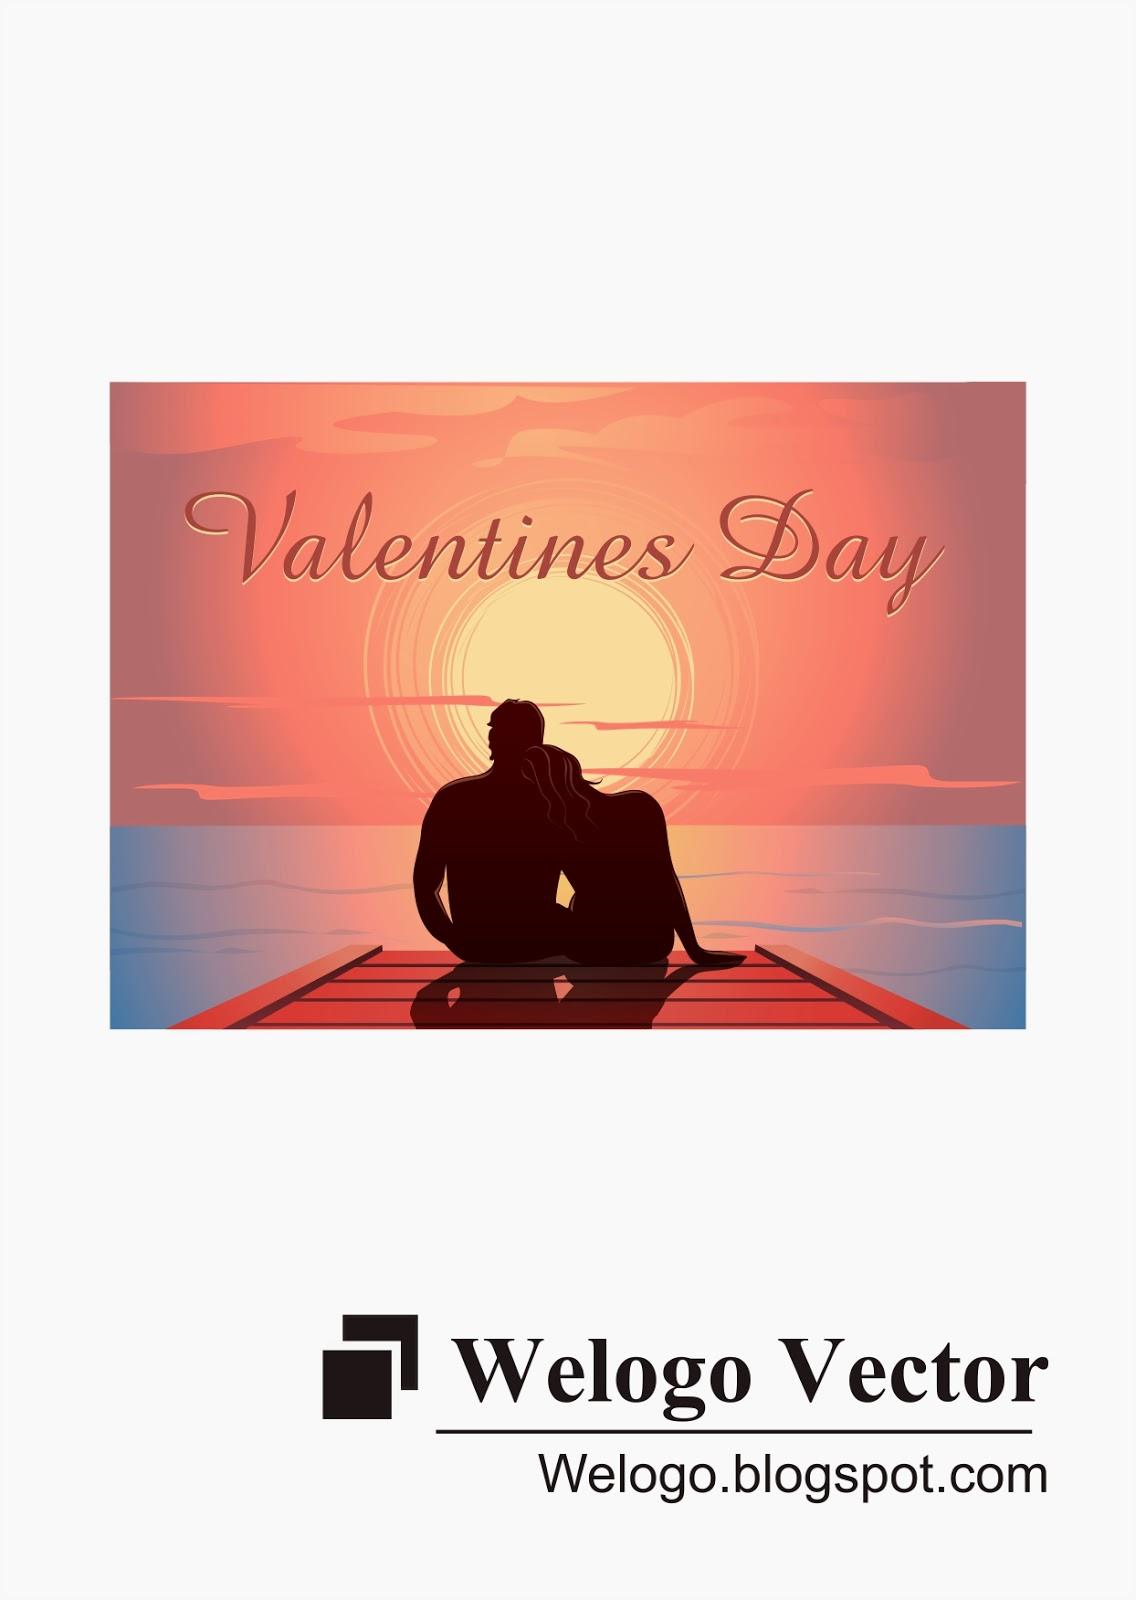 Valentin Day Card